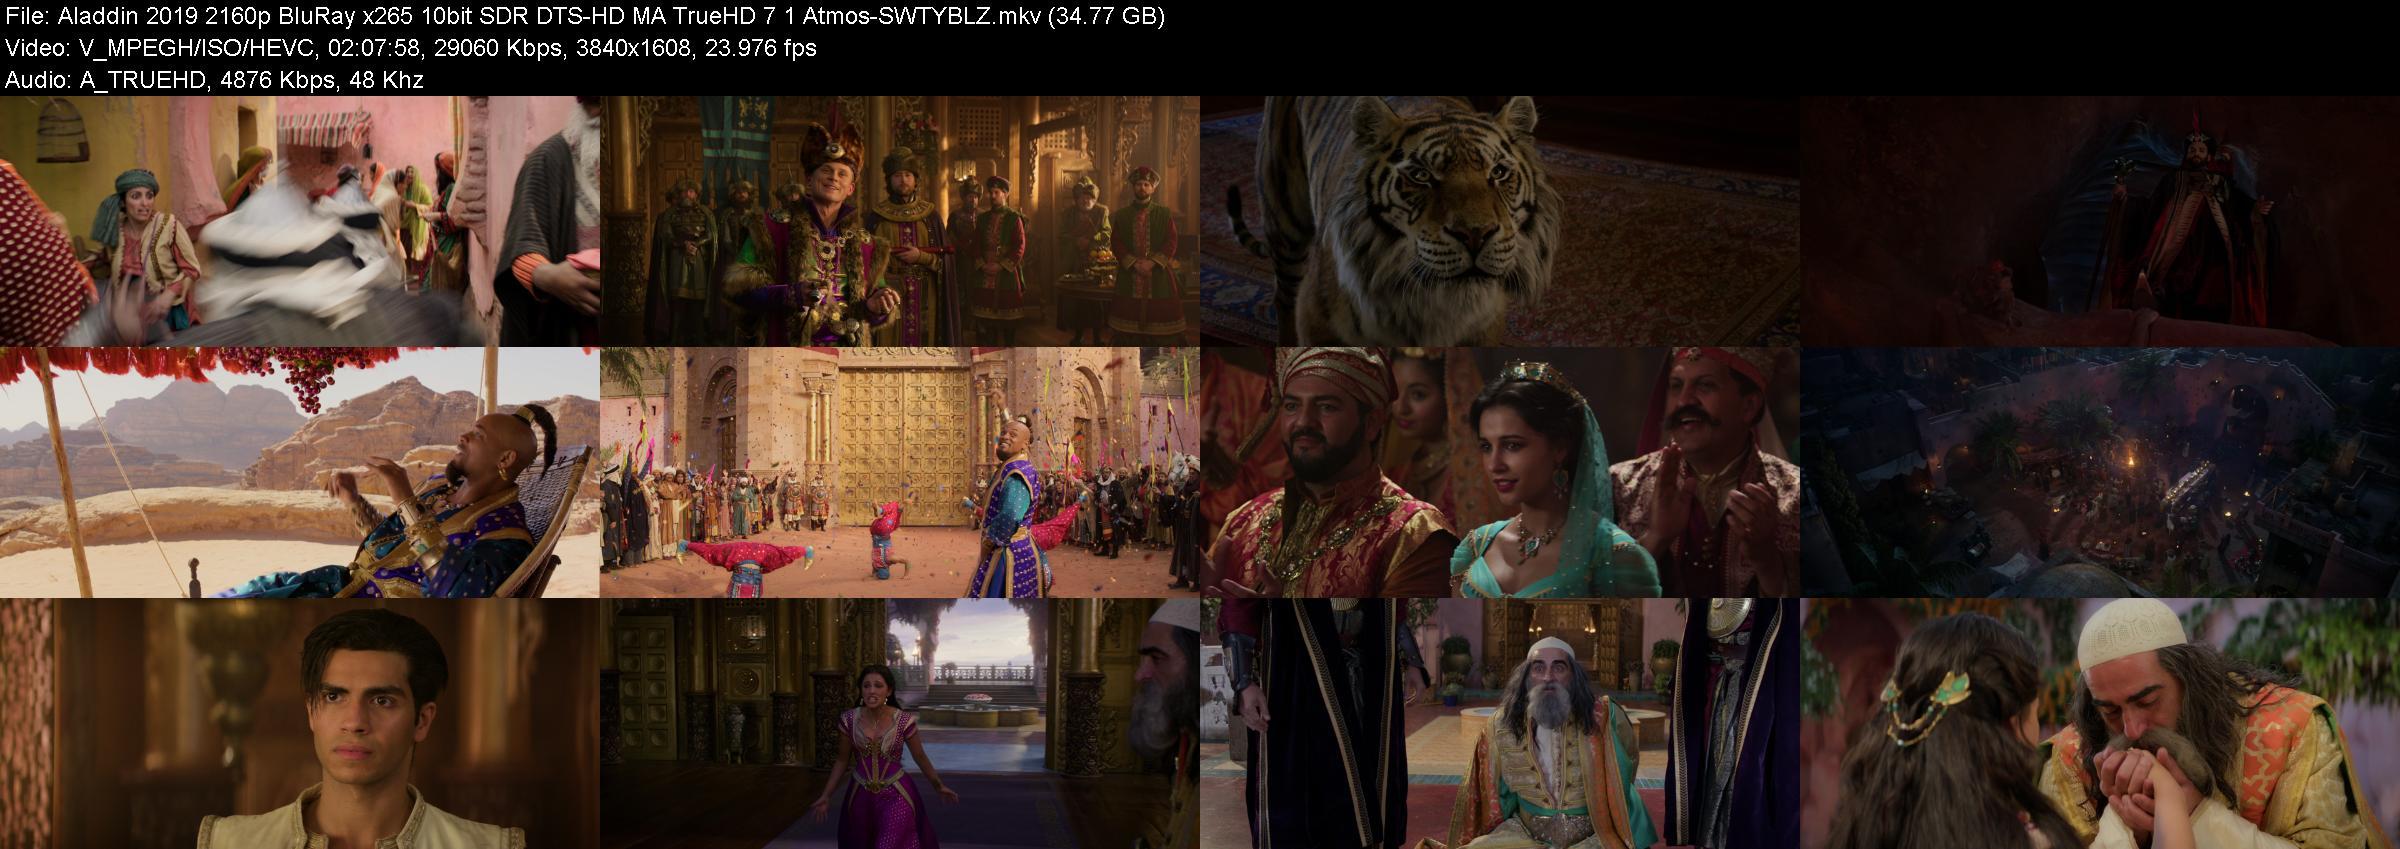 Aladdin 2019 2160p BluRay x265 10bit SDR DTS-HD MA TrueHD 7 1 Atmos-SWTYBLZ